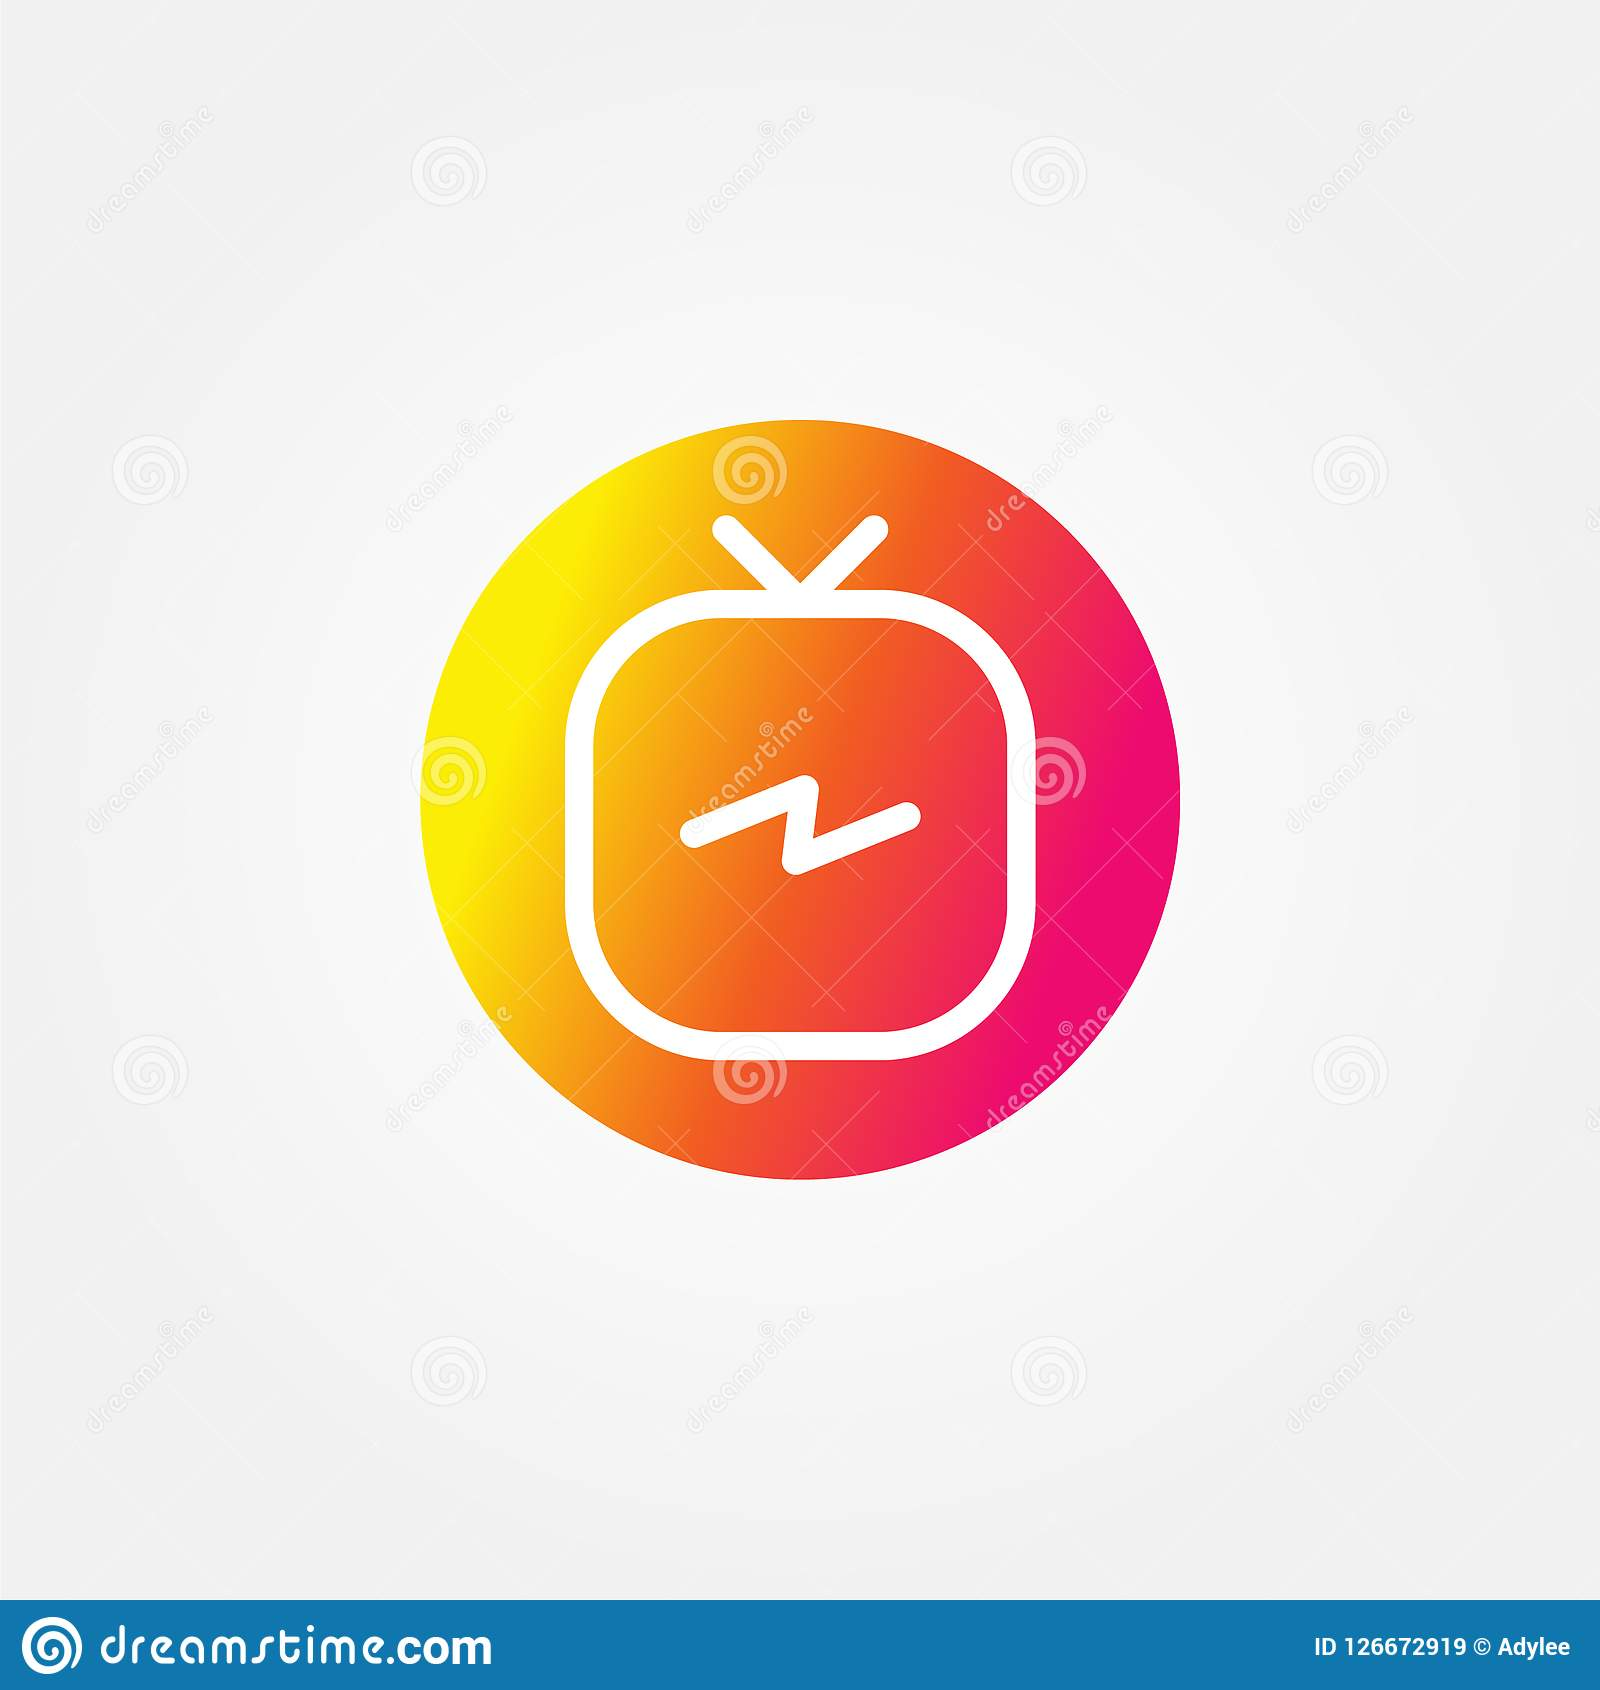 Vector Illustration Instagram: Stock Vector Instagram Tv Logo Editorial Stock Image